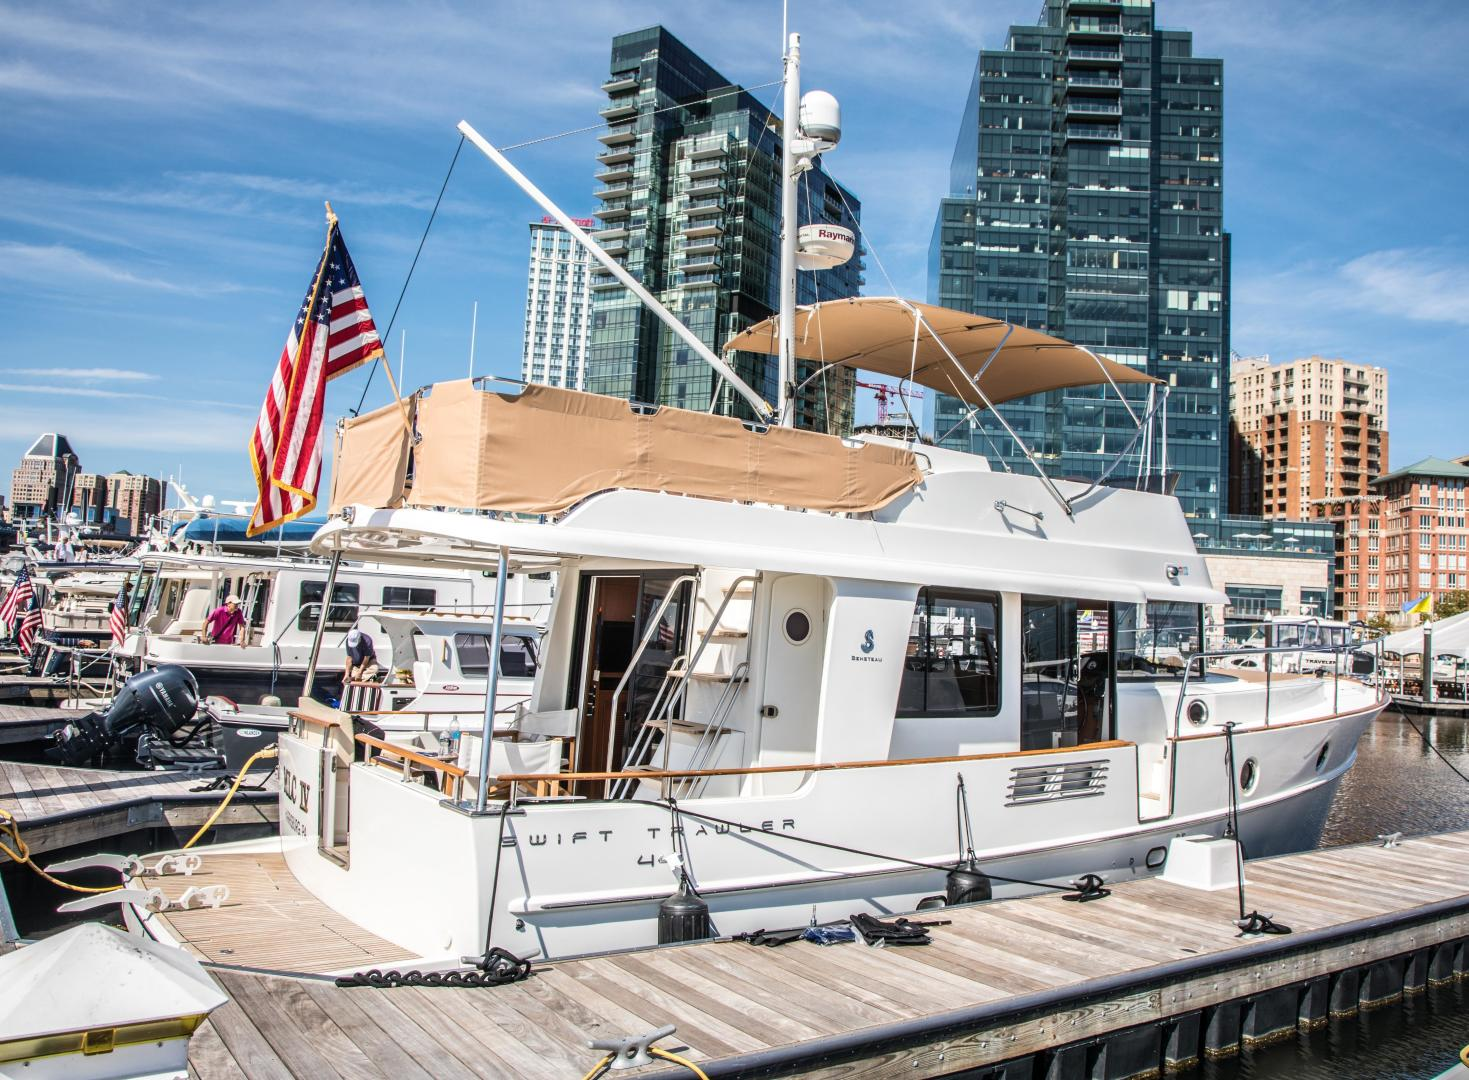 Beneteau-Swift Trawler 2012-MLC IV Baltimore-Maryland-United States-1355971 | Thumbnail